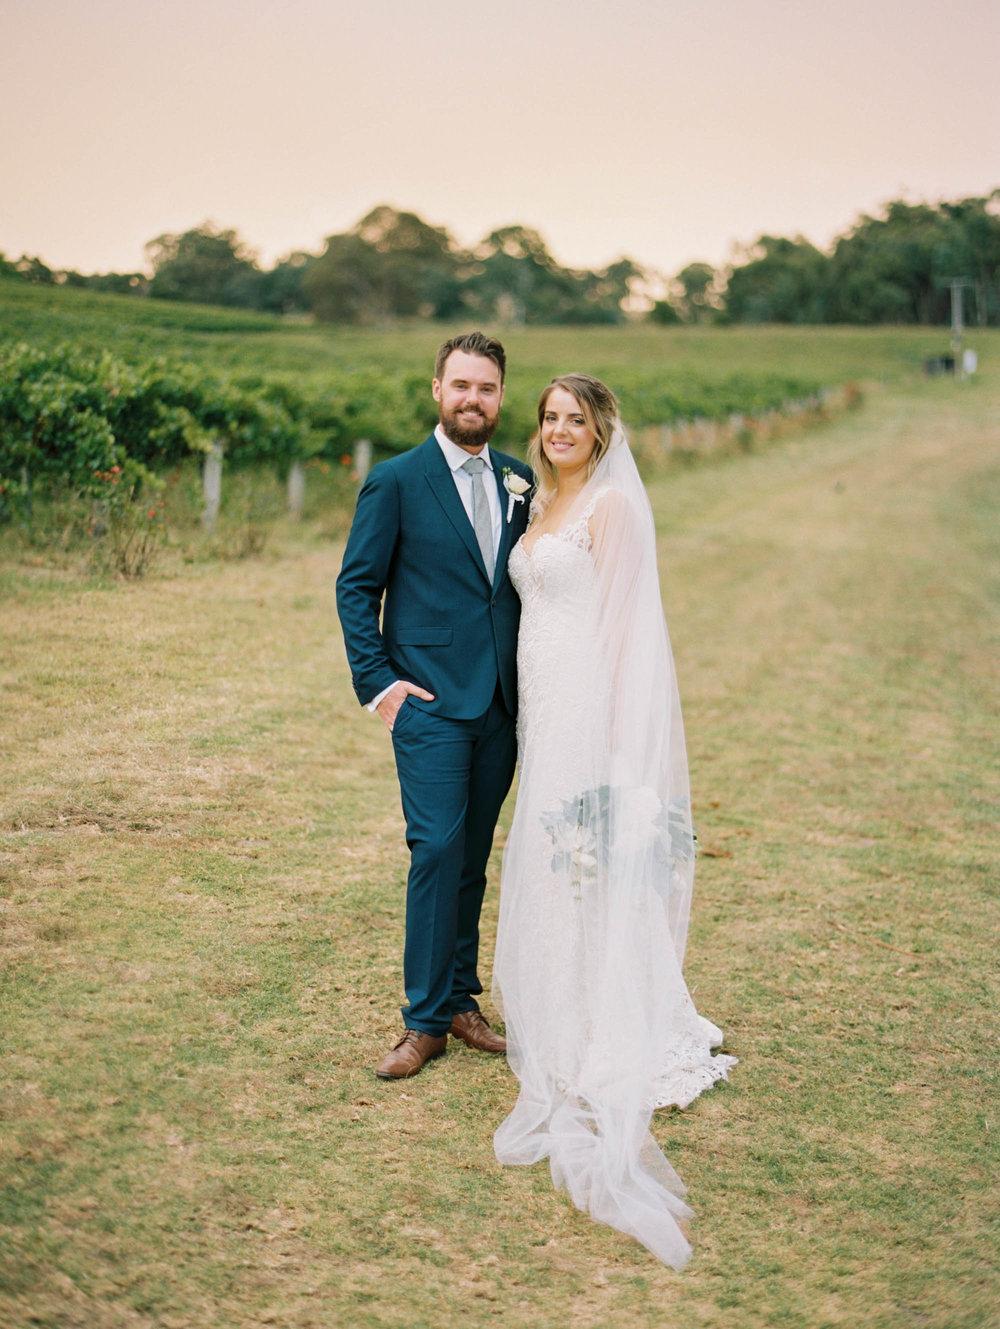 Golding-Wines-wedding-photography-088.jpg